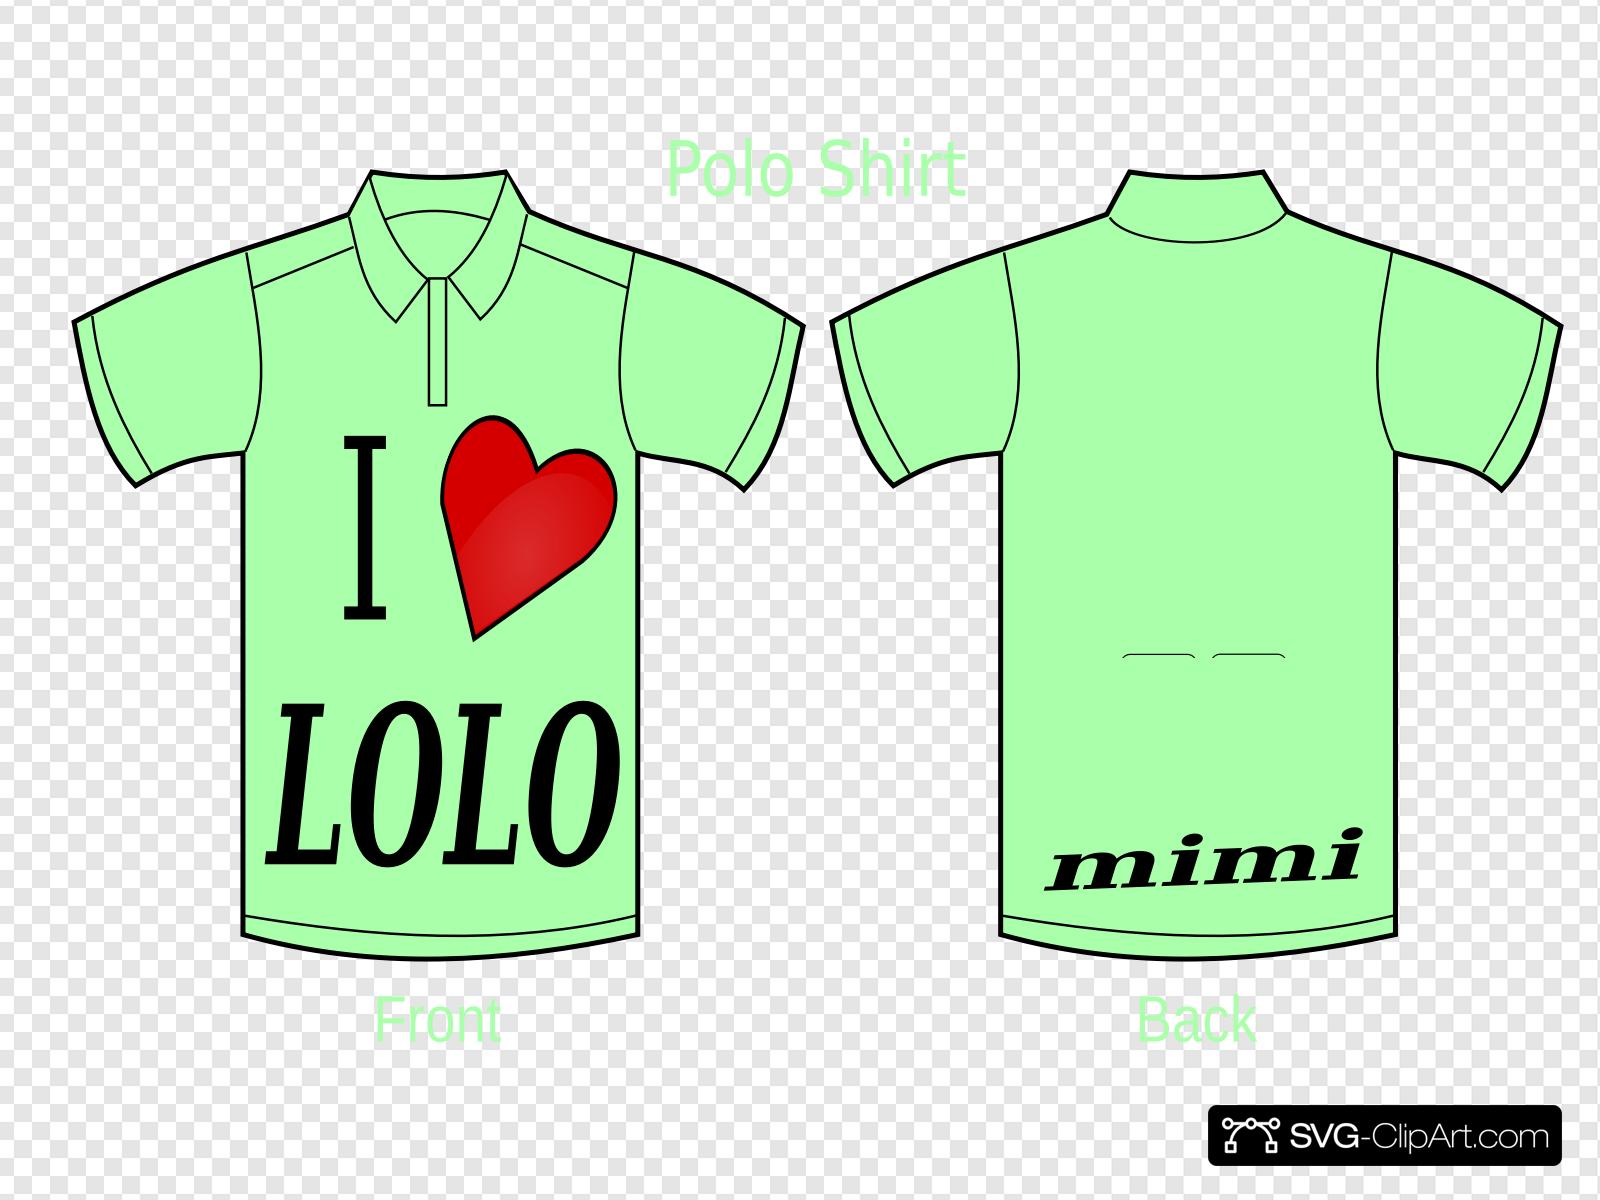 Green Lolo Clip art, Icon and SVG.